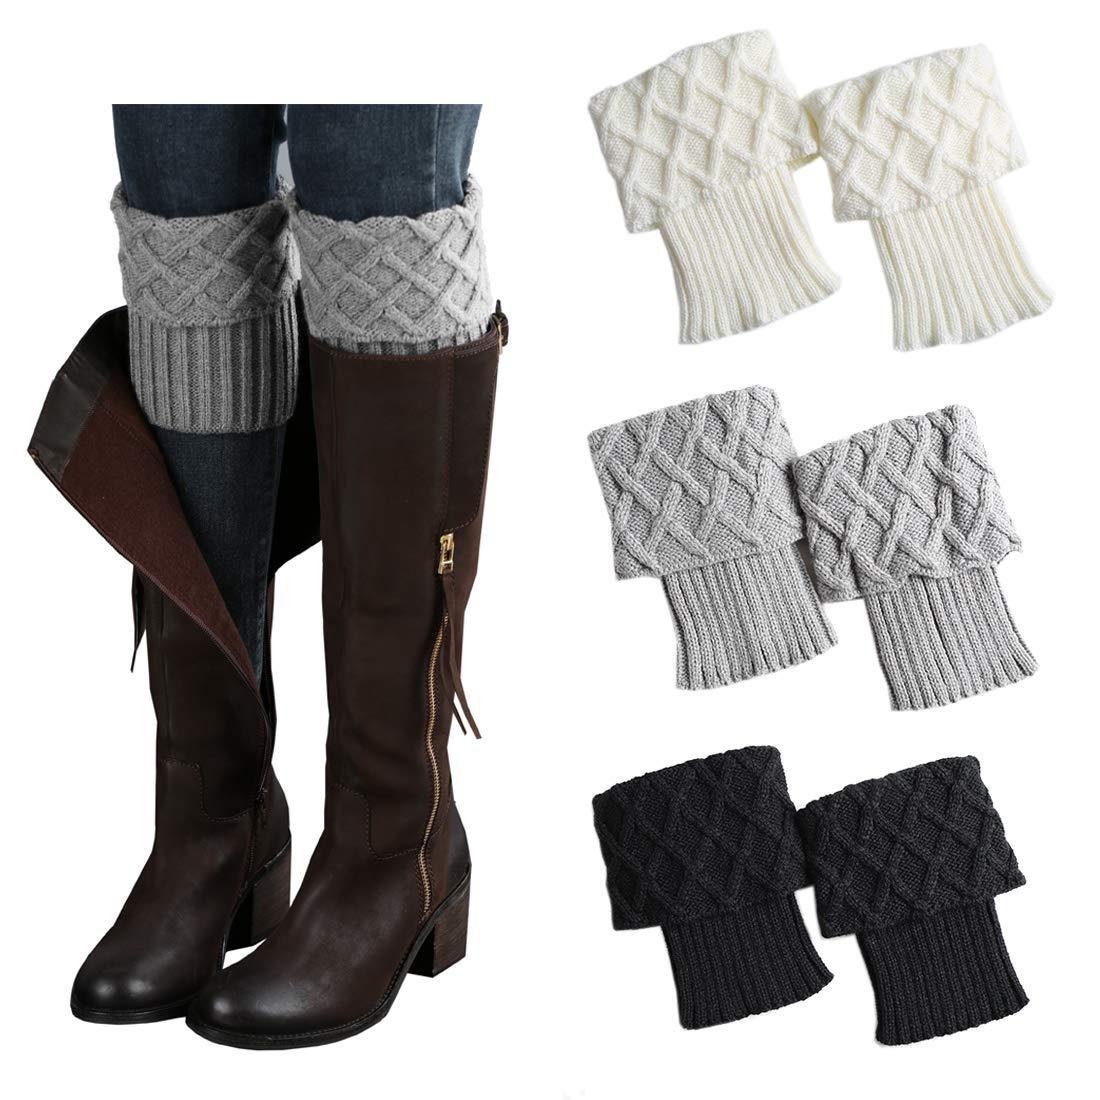 3 Pairs Women Boot Cuffs Leg Warmers Crochet Short Knitted Socks Warm Toppers Winter FAYBOX